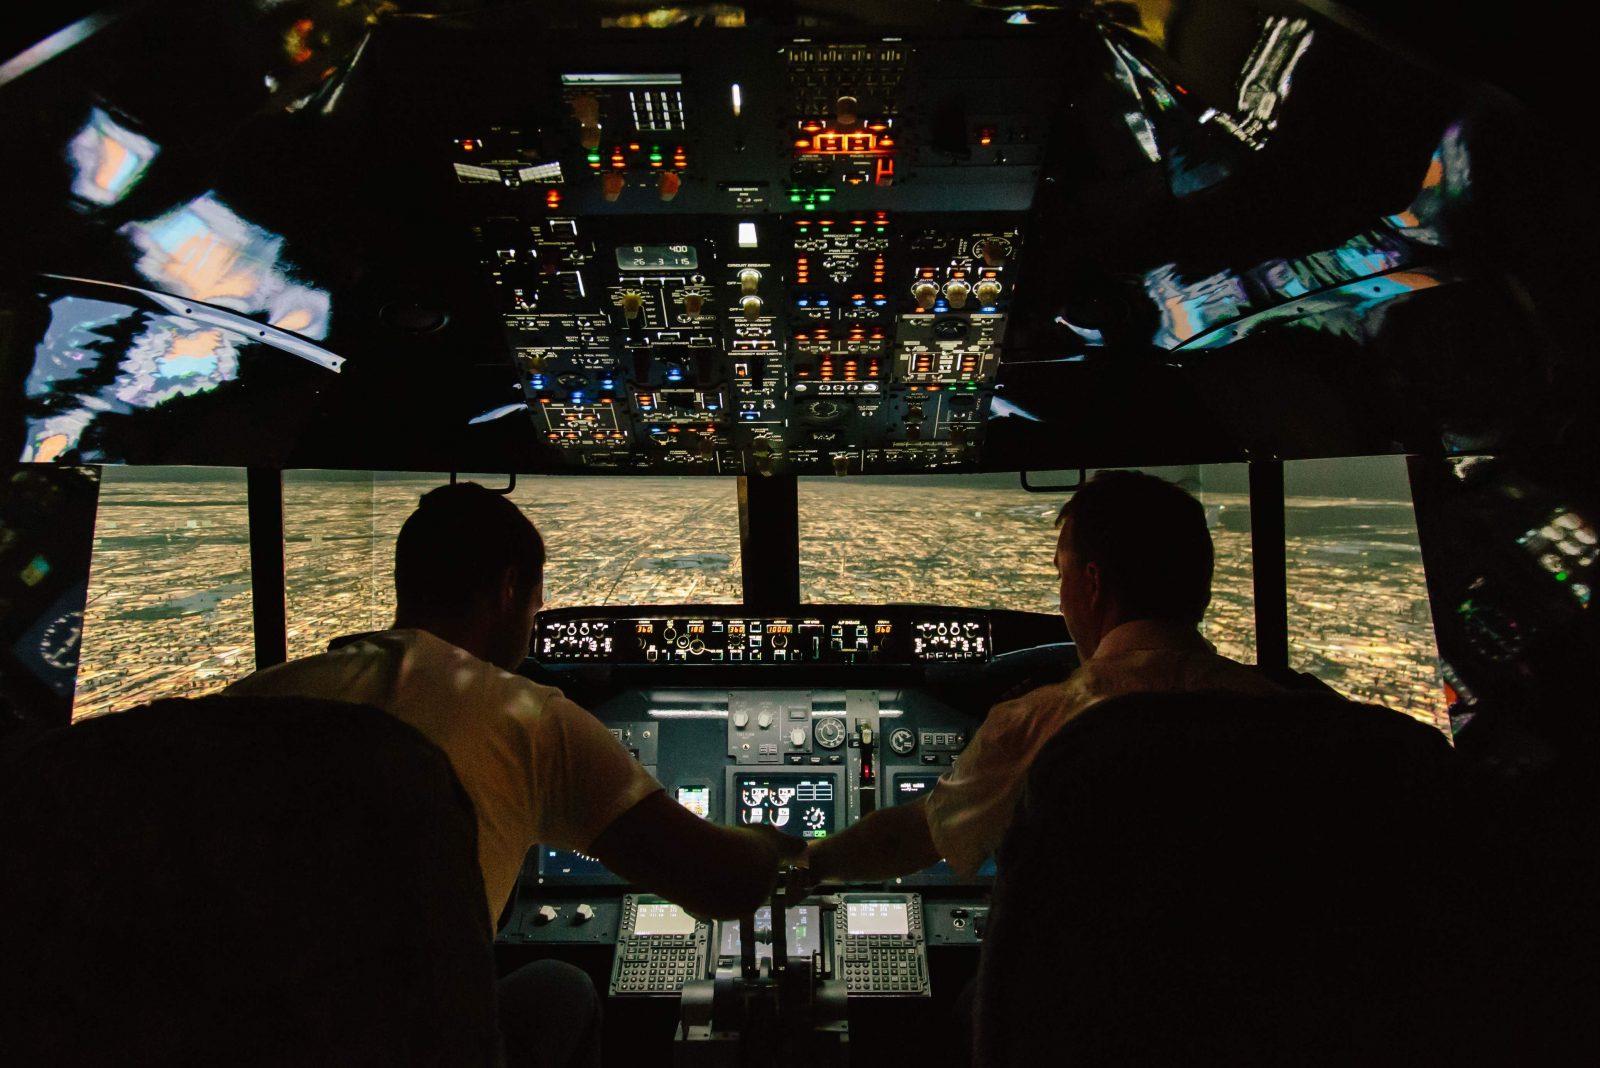 Taking a night flight in the simulator